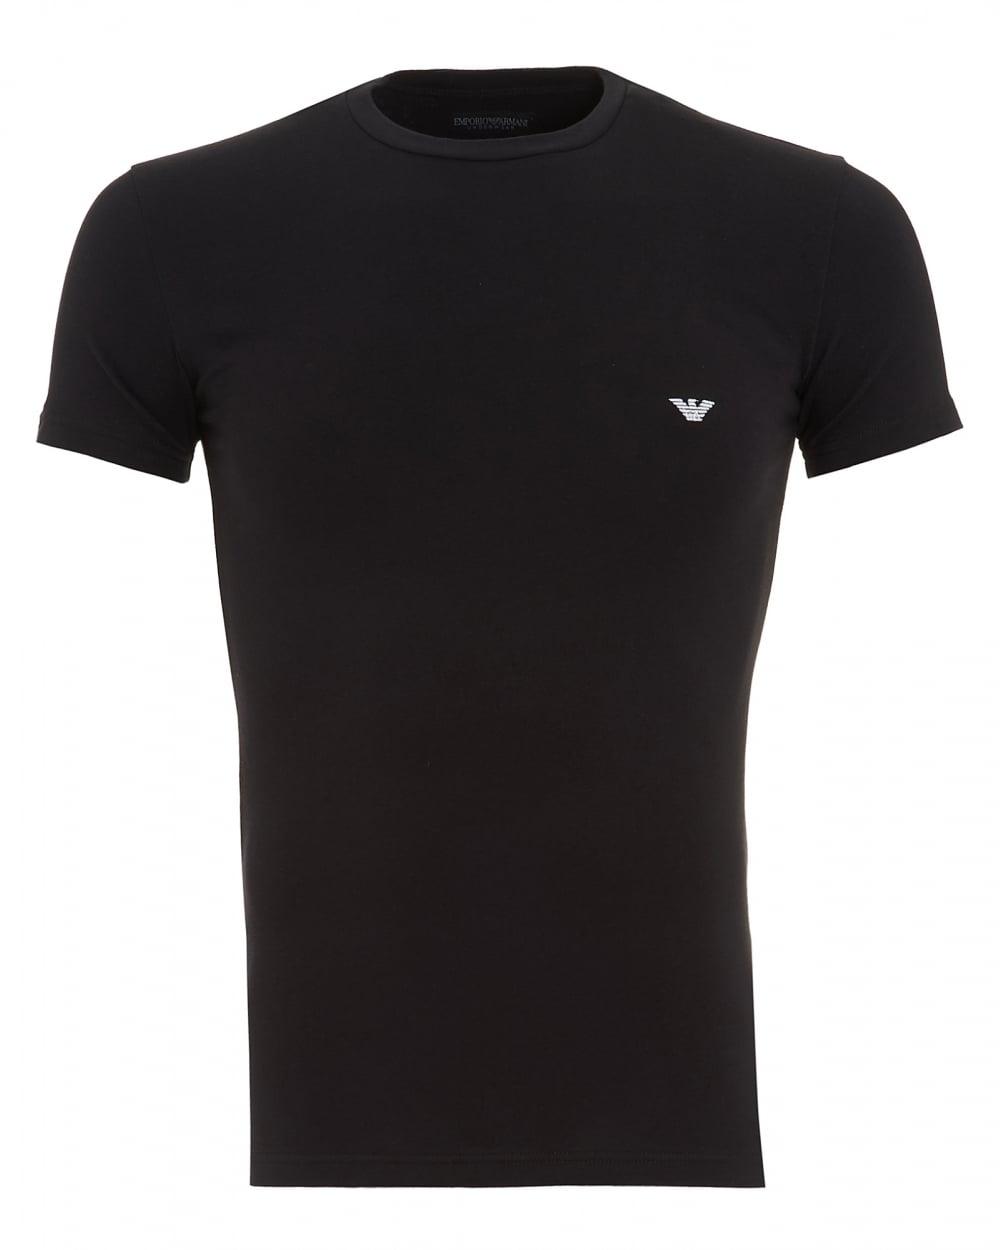 Emporio Armani Mens T Shirt Black Small Logo Tee